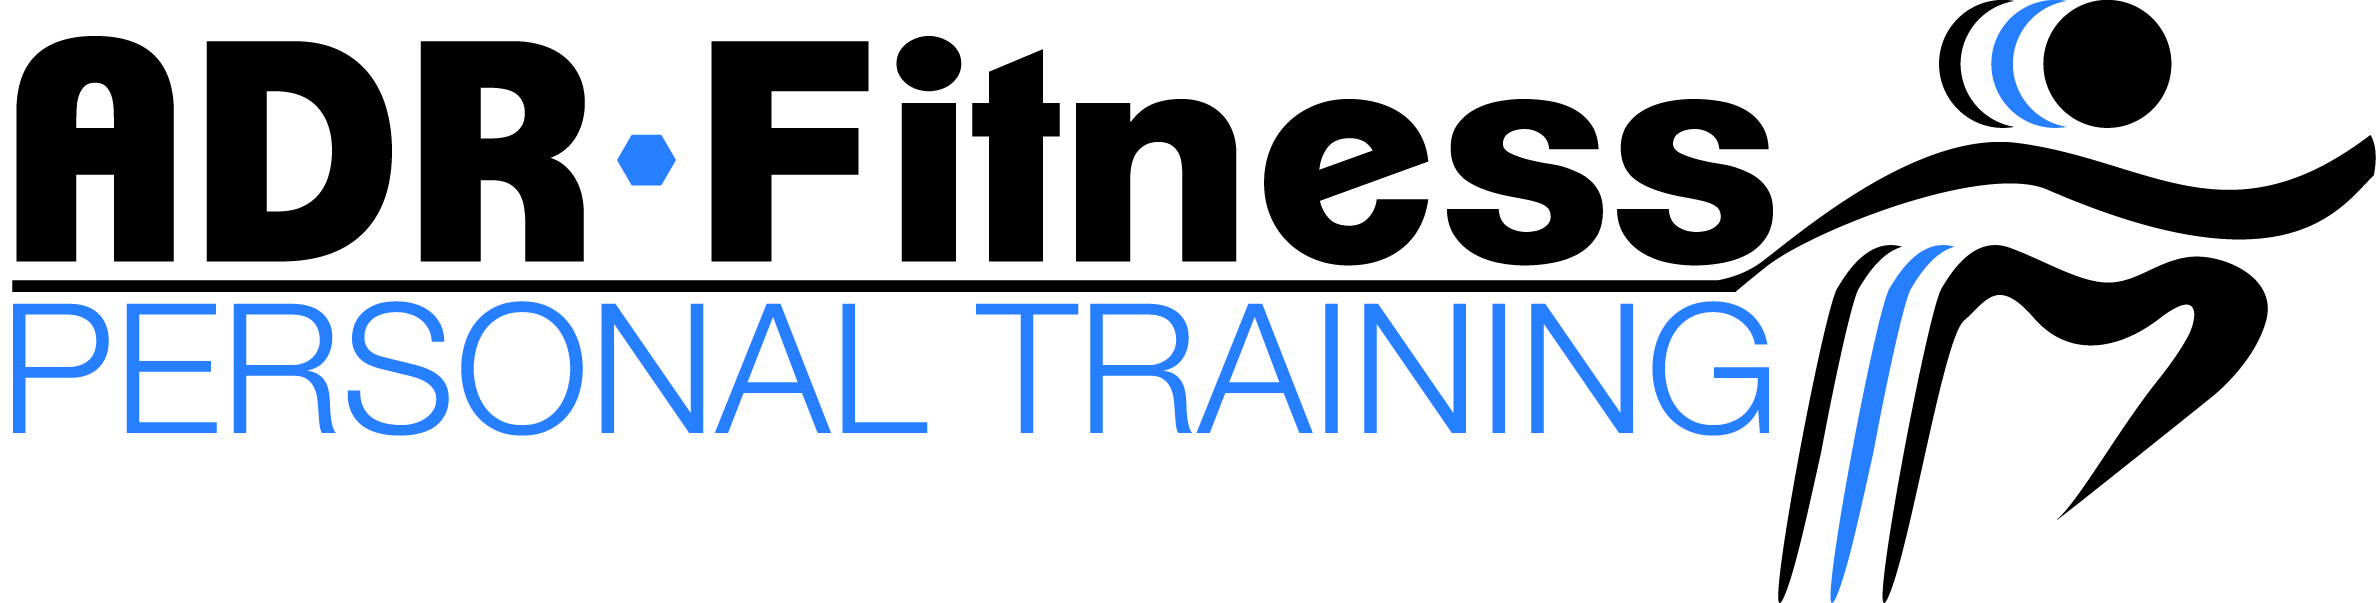 adr fitness.